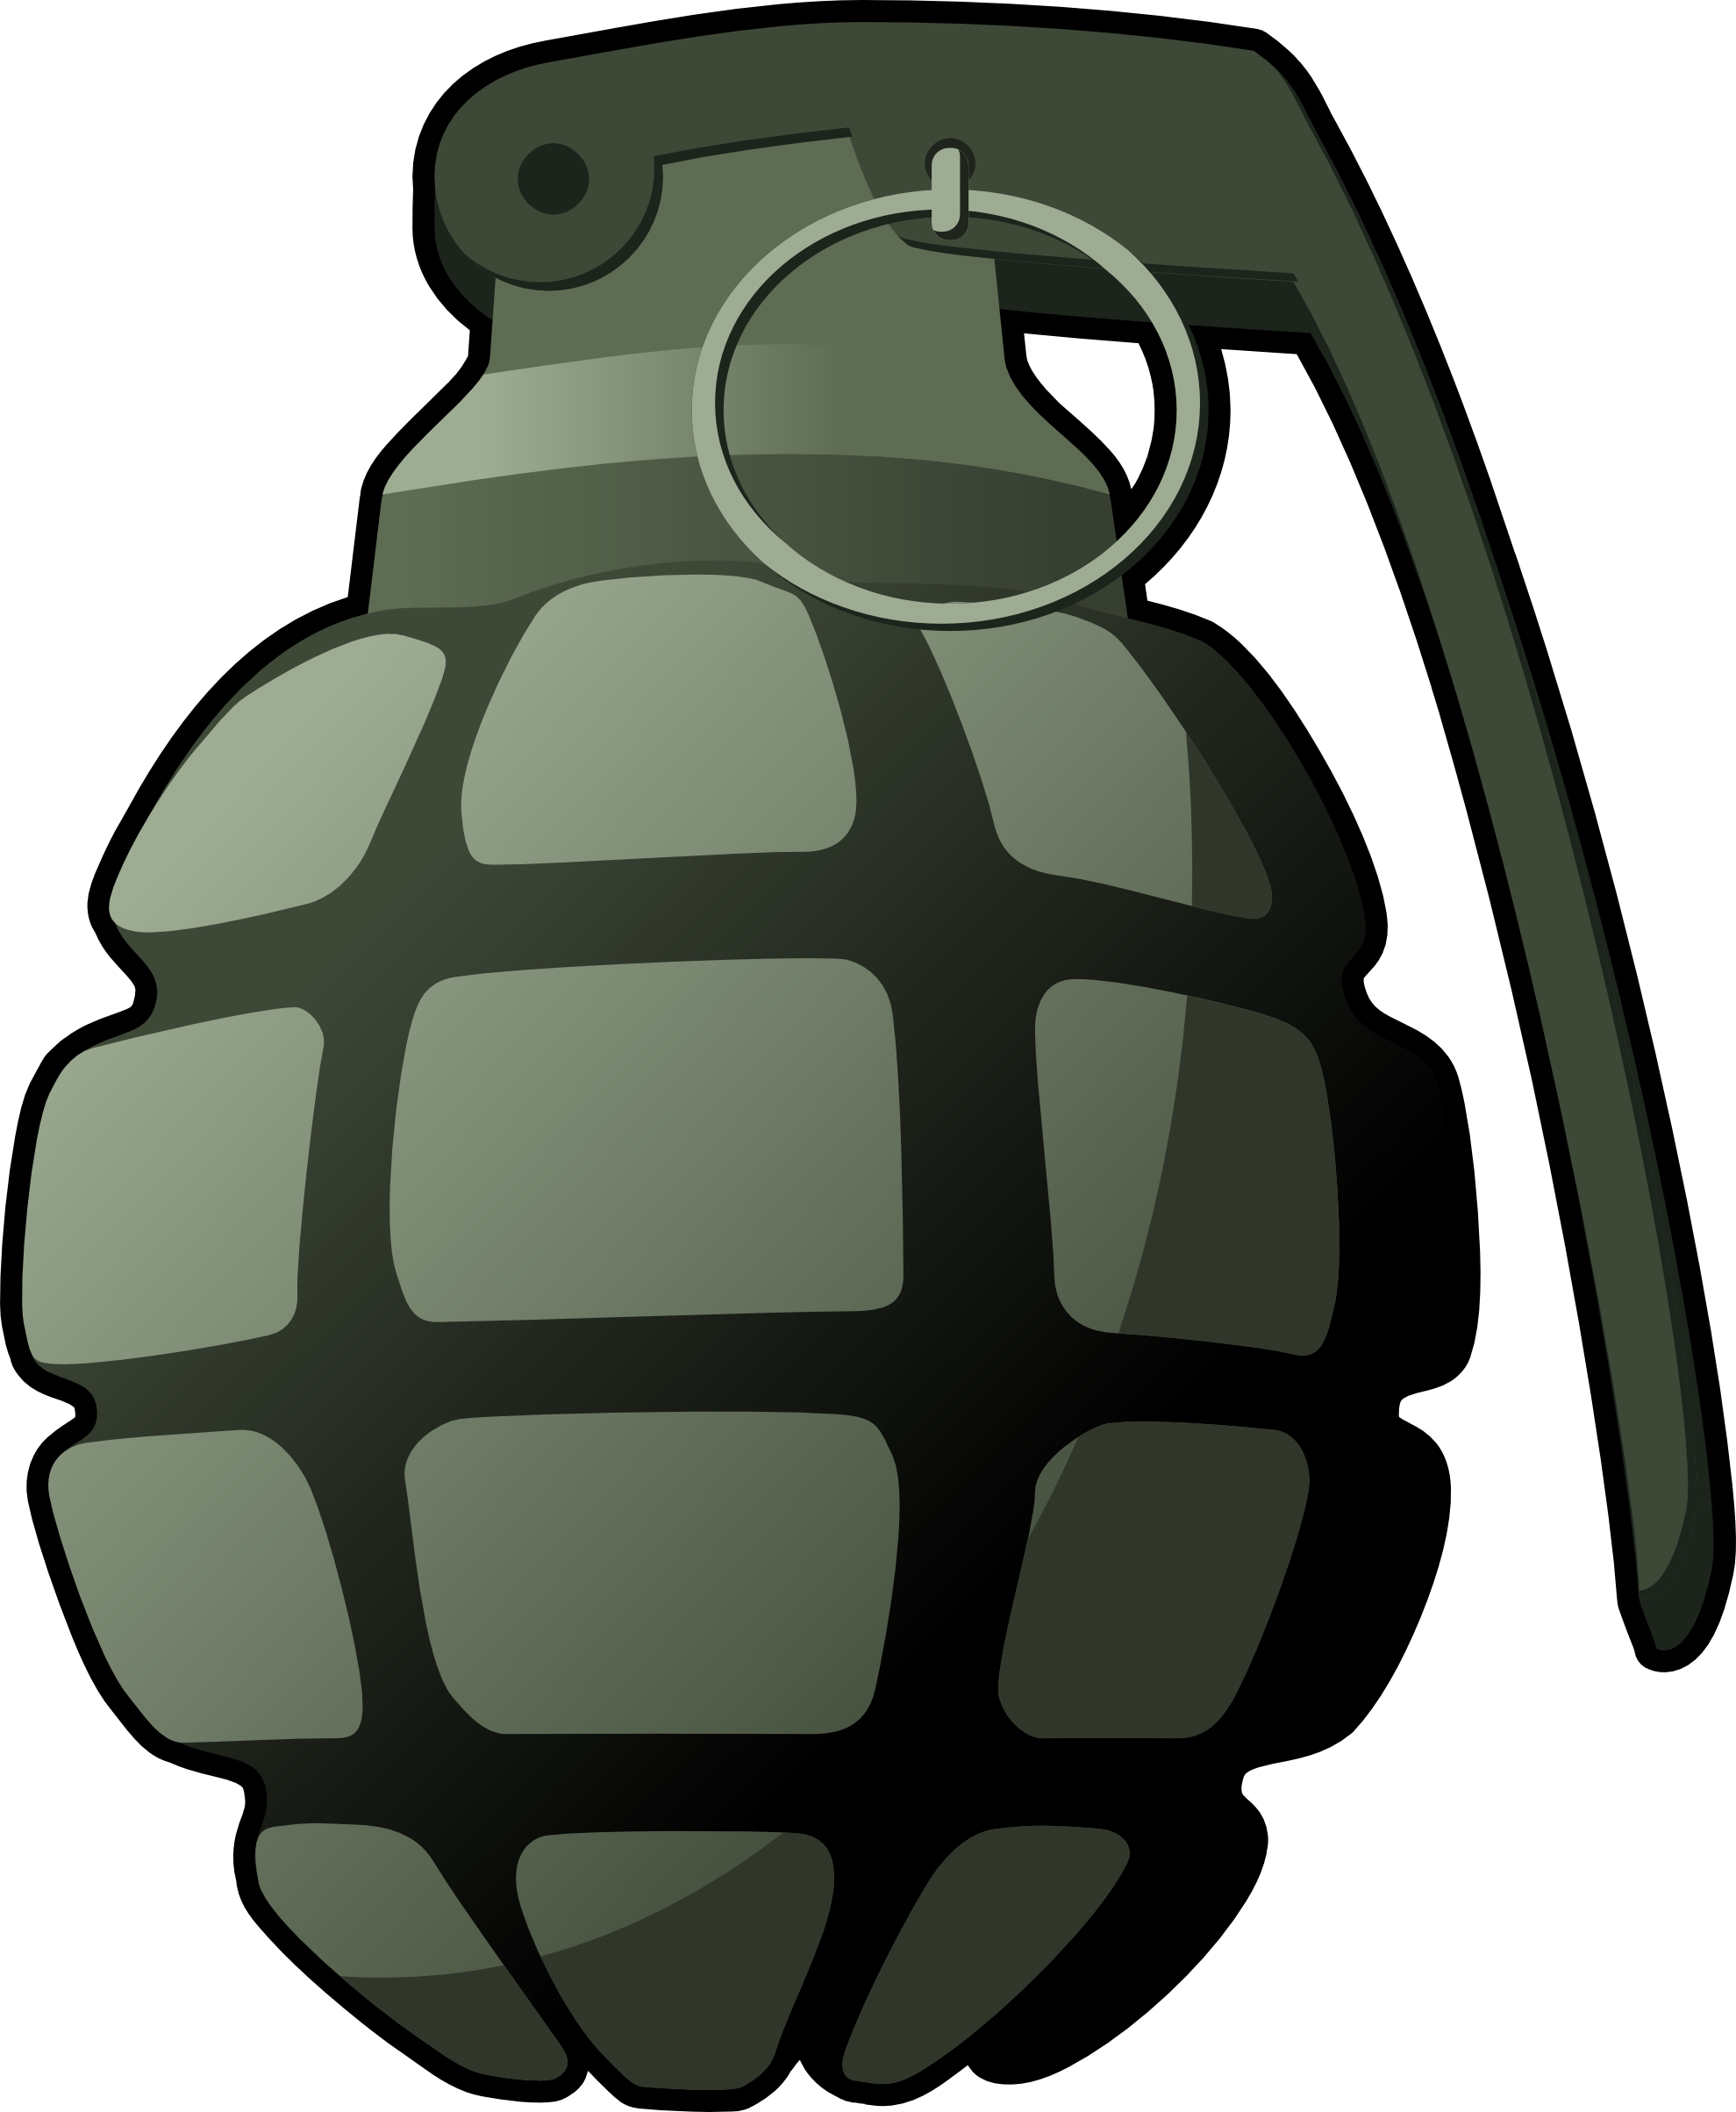 Grenade F1 Png Image - Grenade, Transparent background PNG HD thumbnail